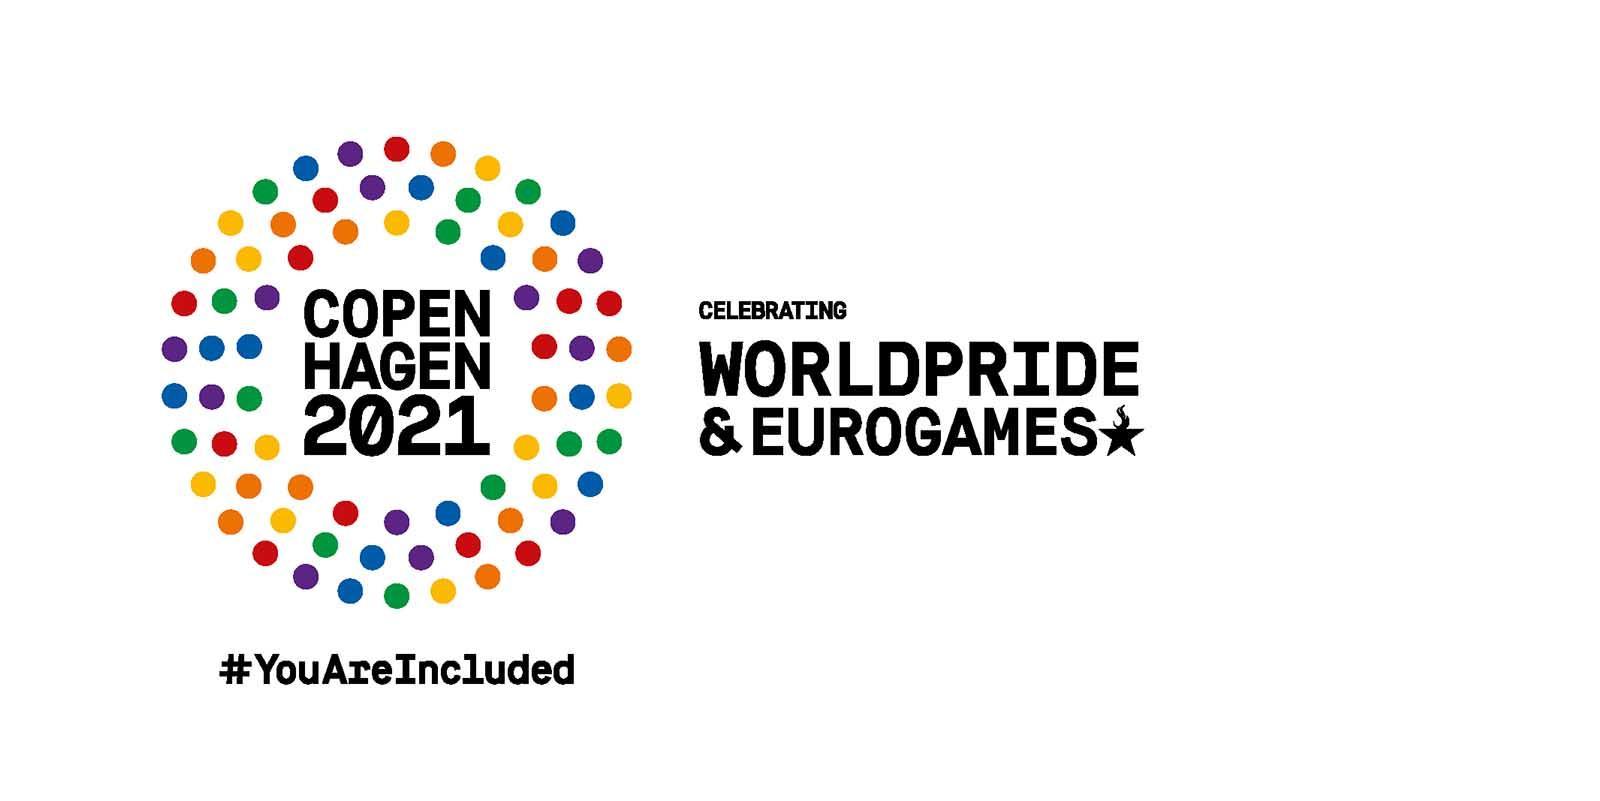 Worldpride and Eurogames - Copenhagen 2021